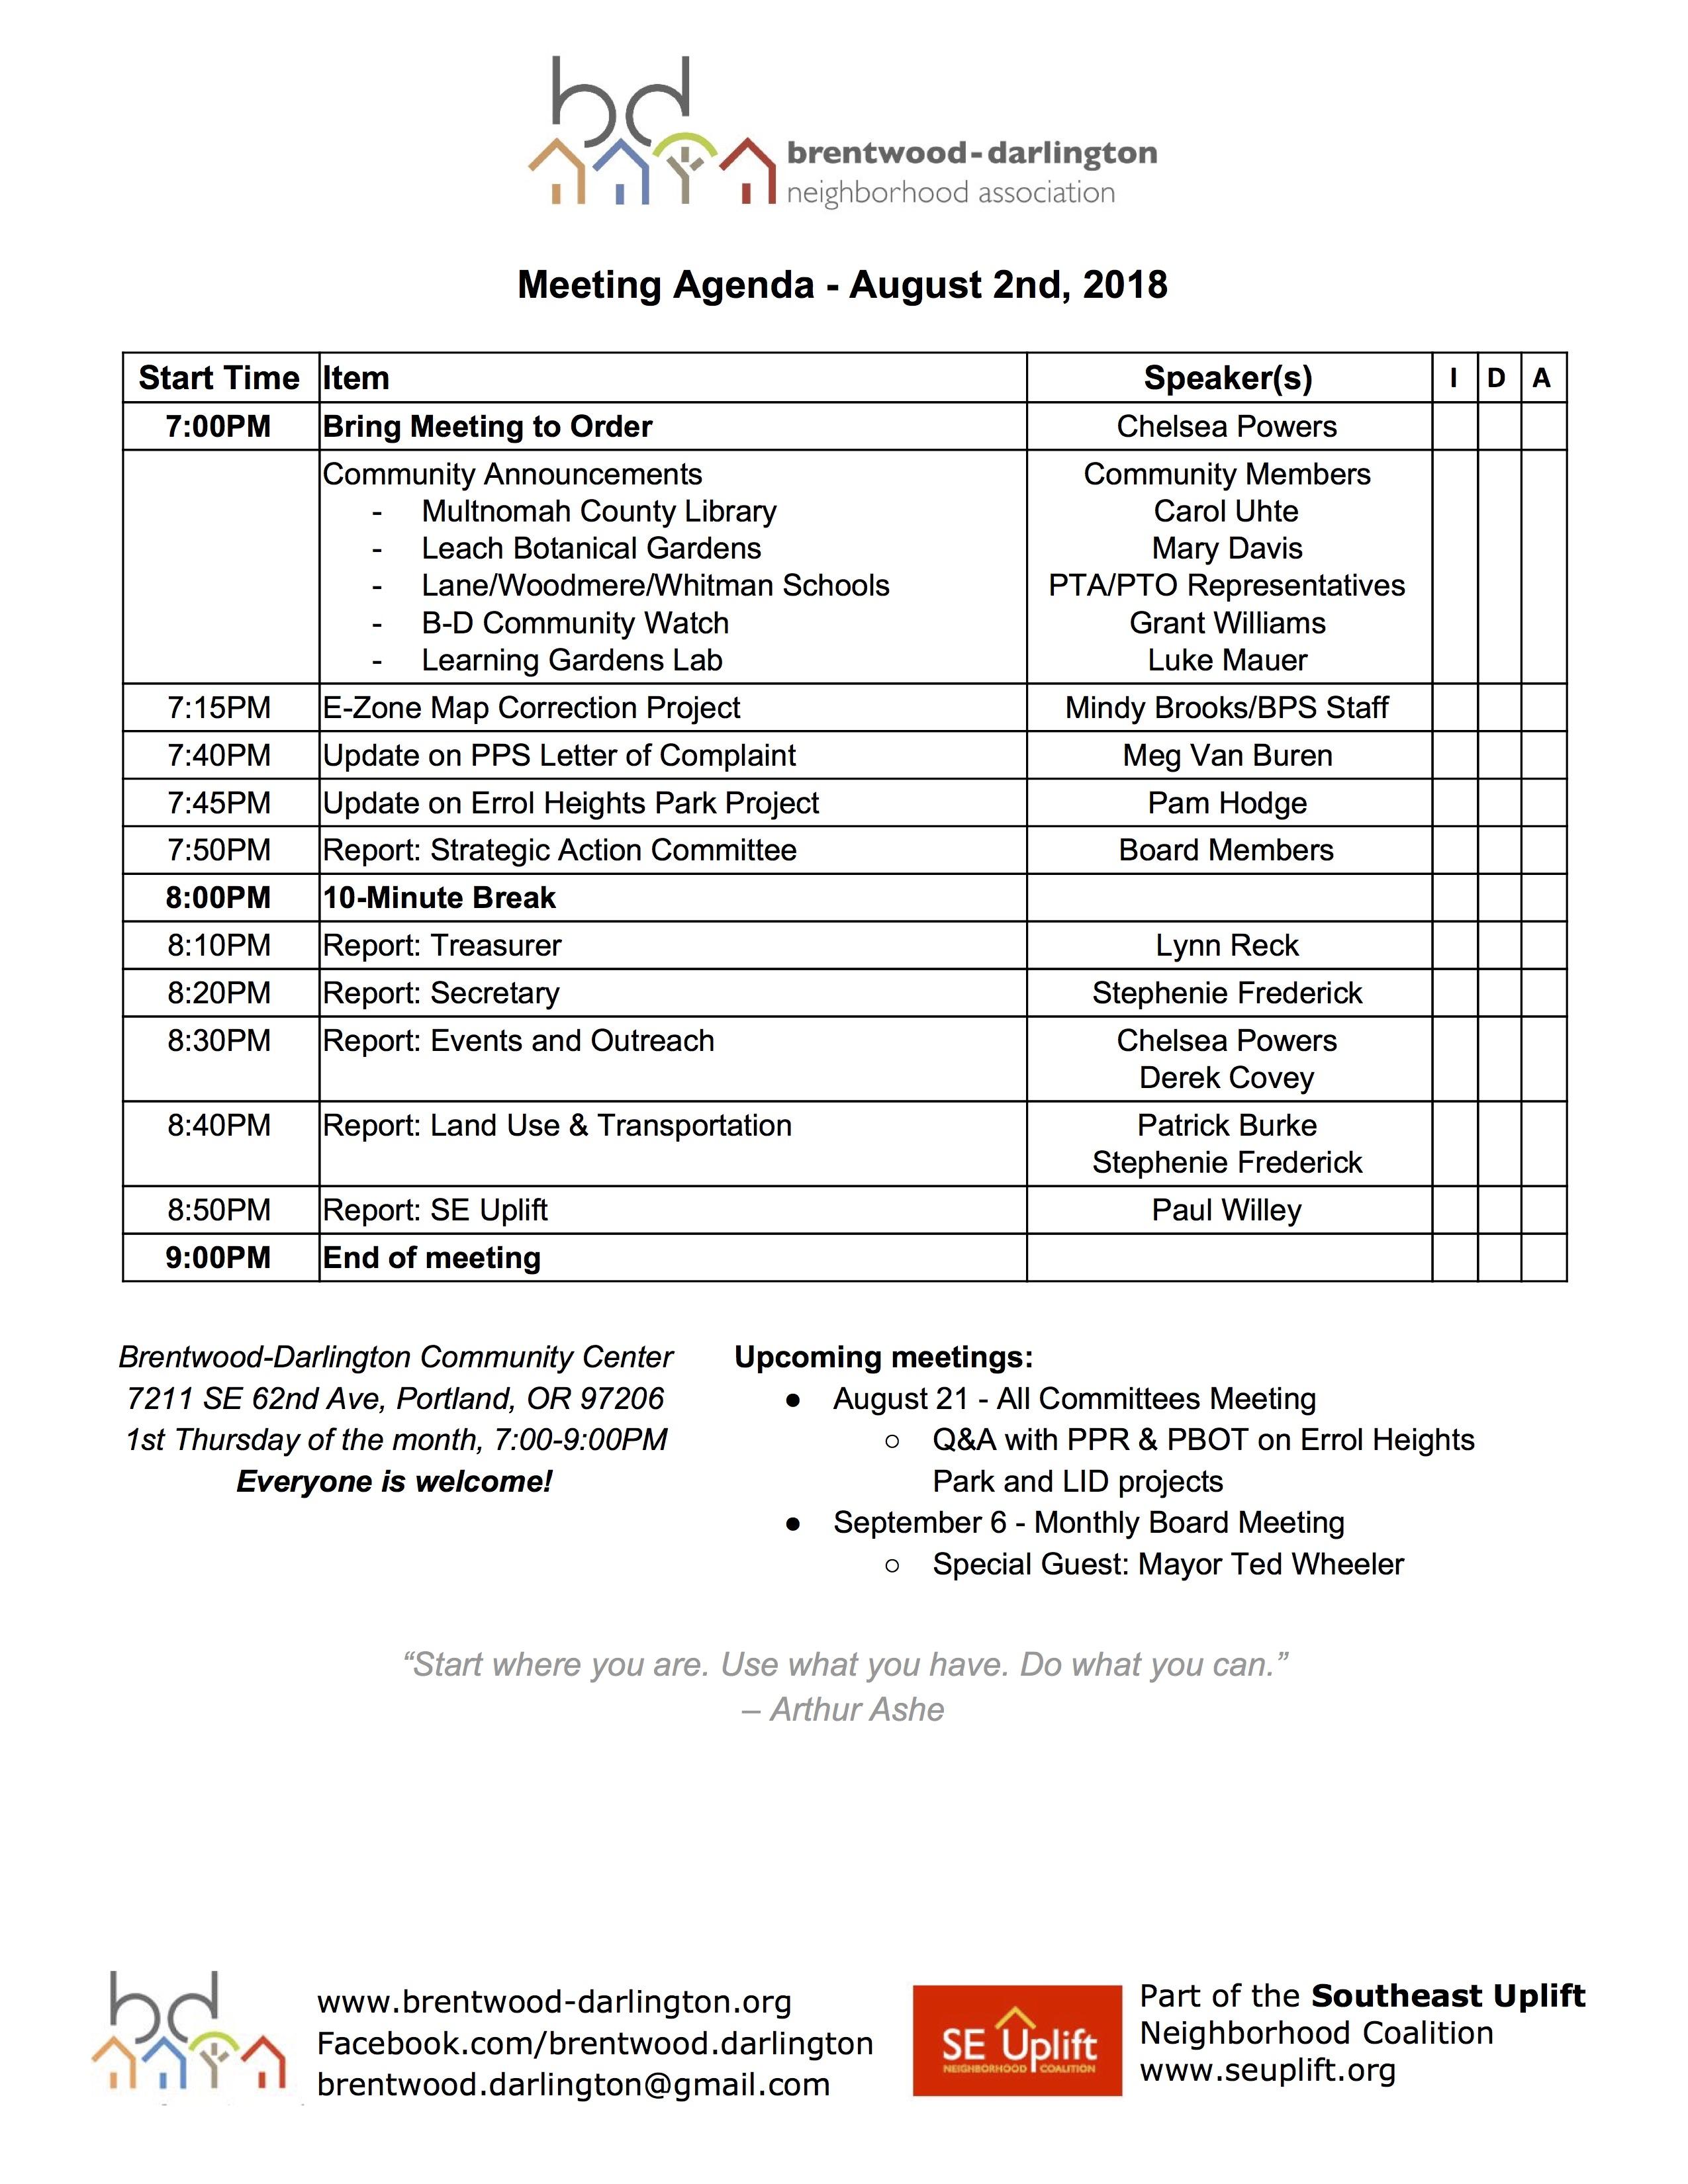 Meeting Agenda - August 2018